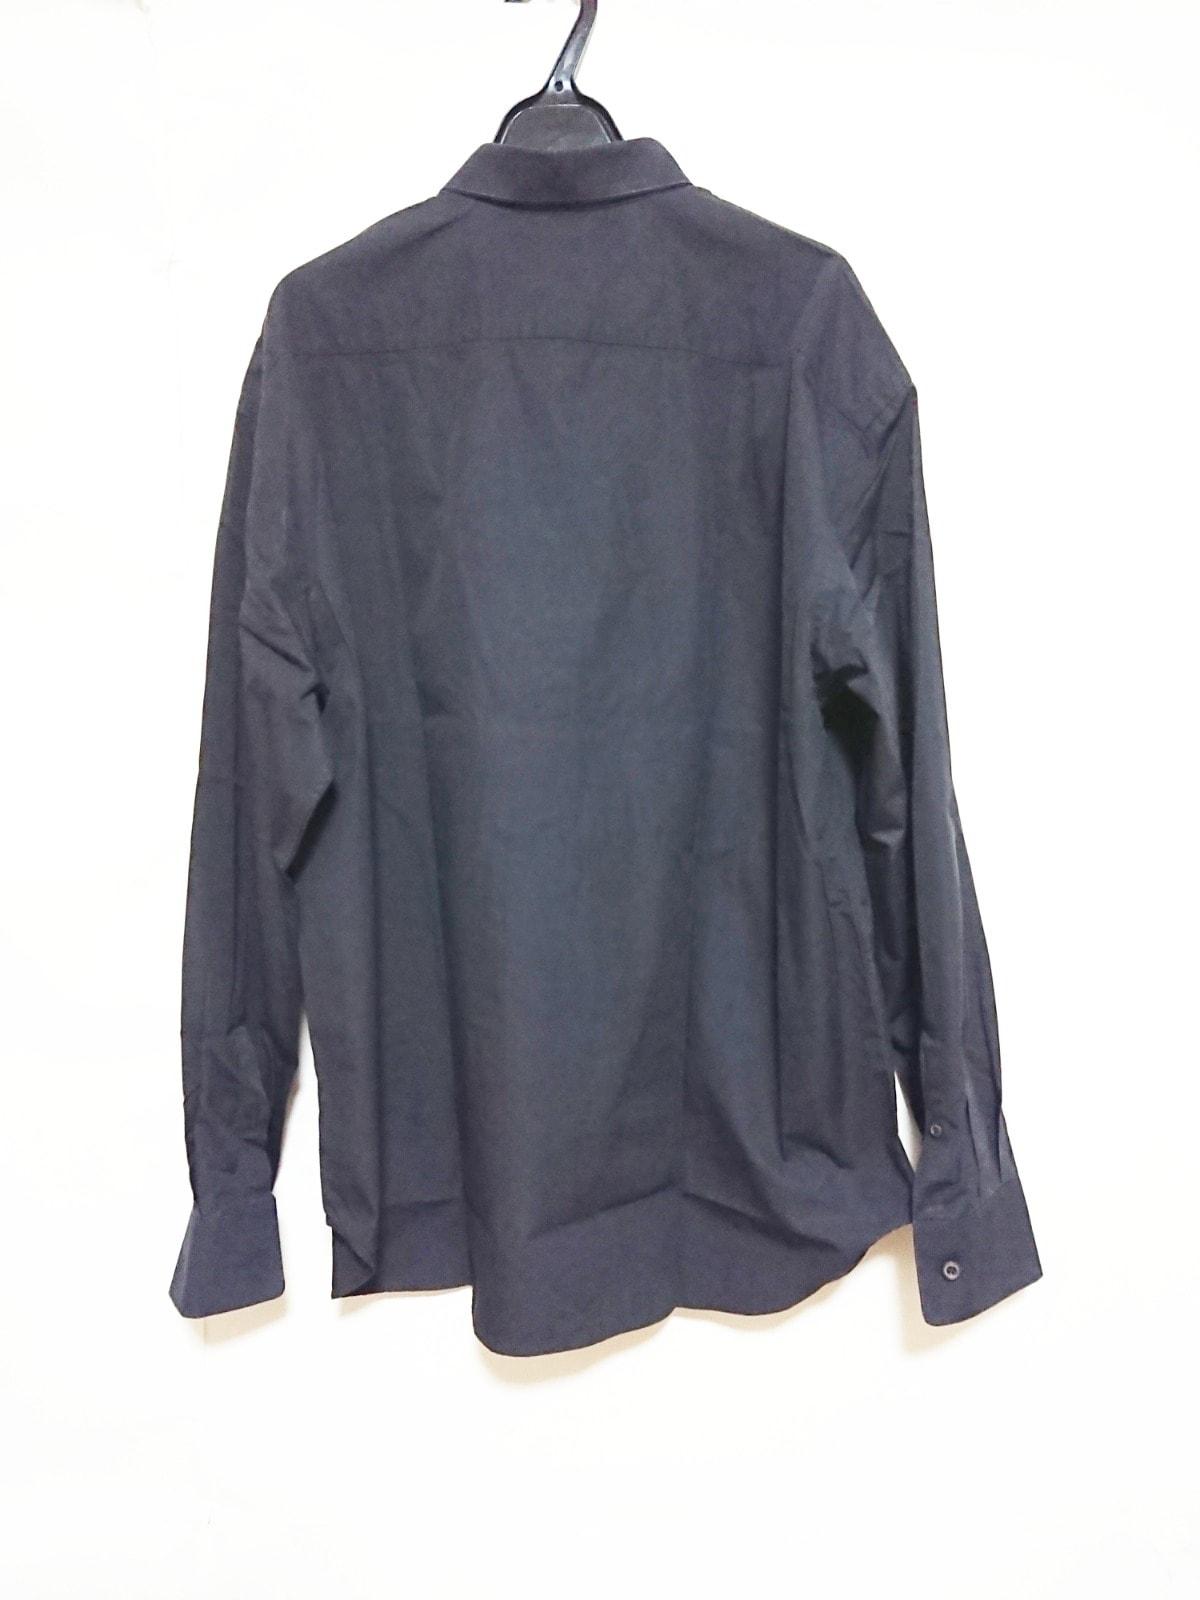 PRADA(プラダ)のシャツ